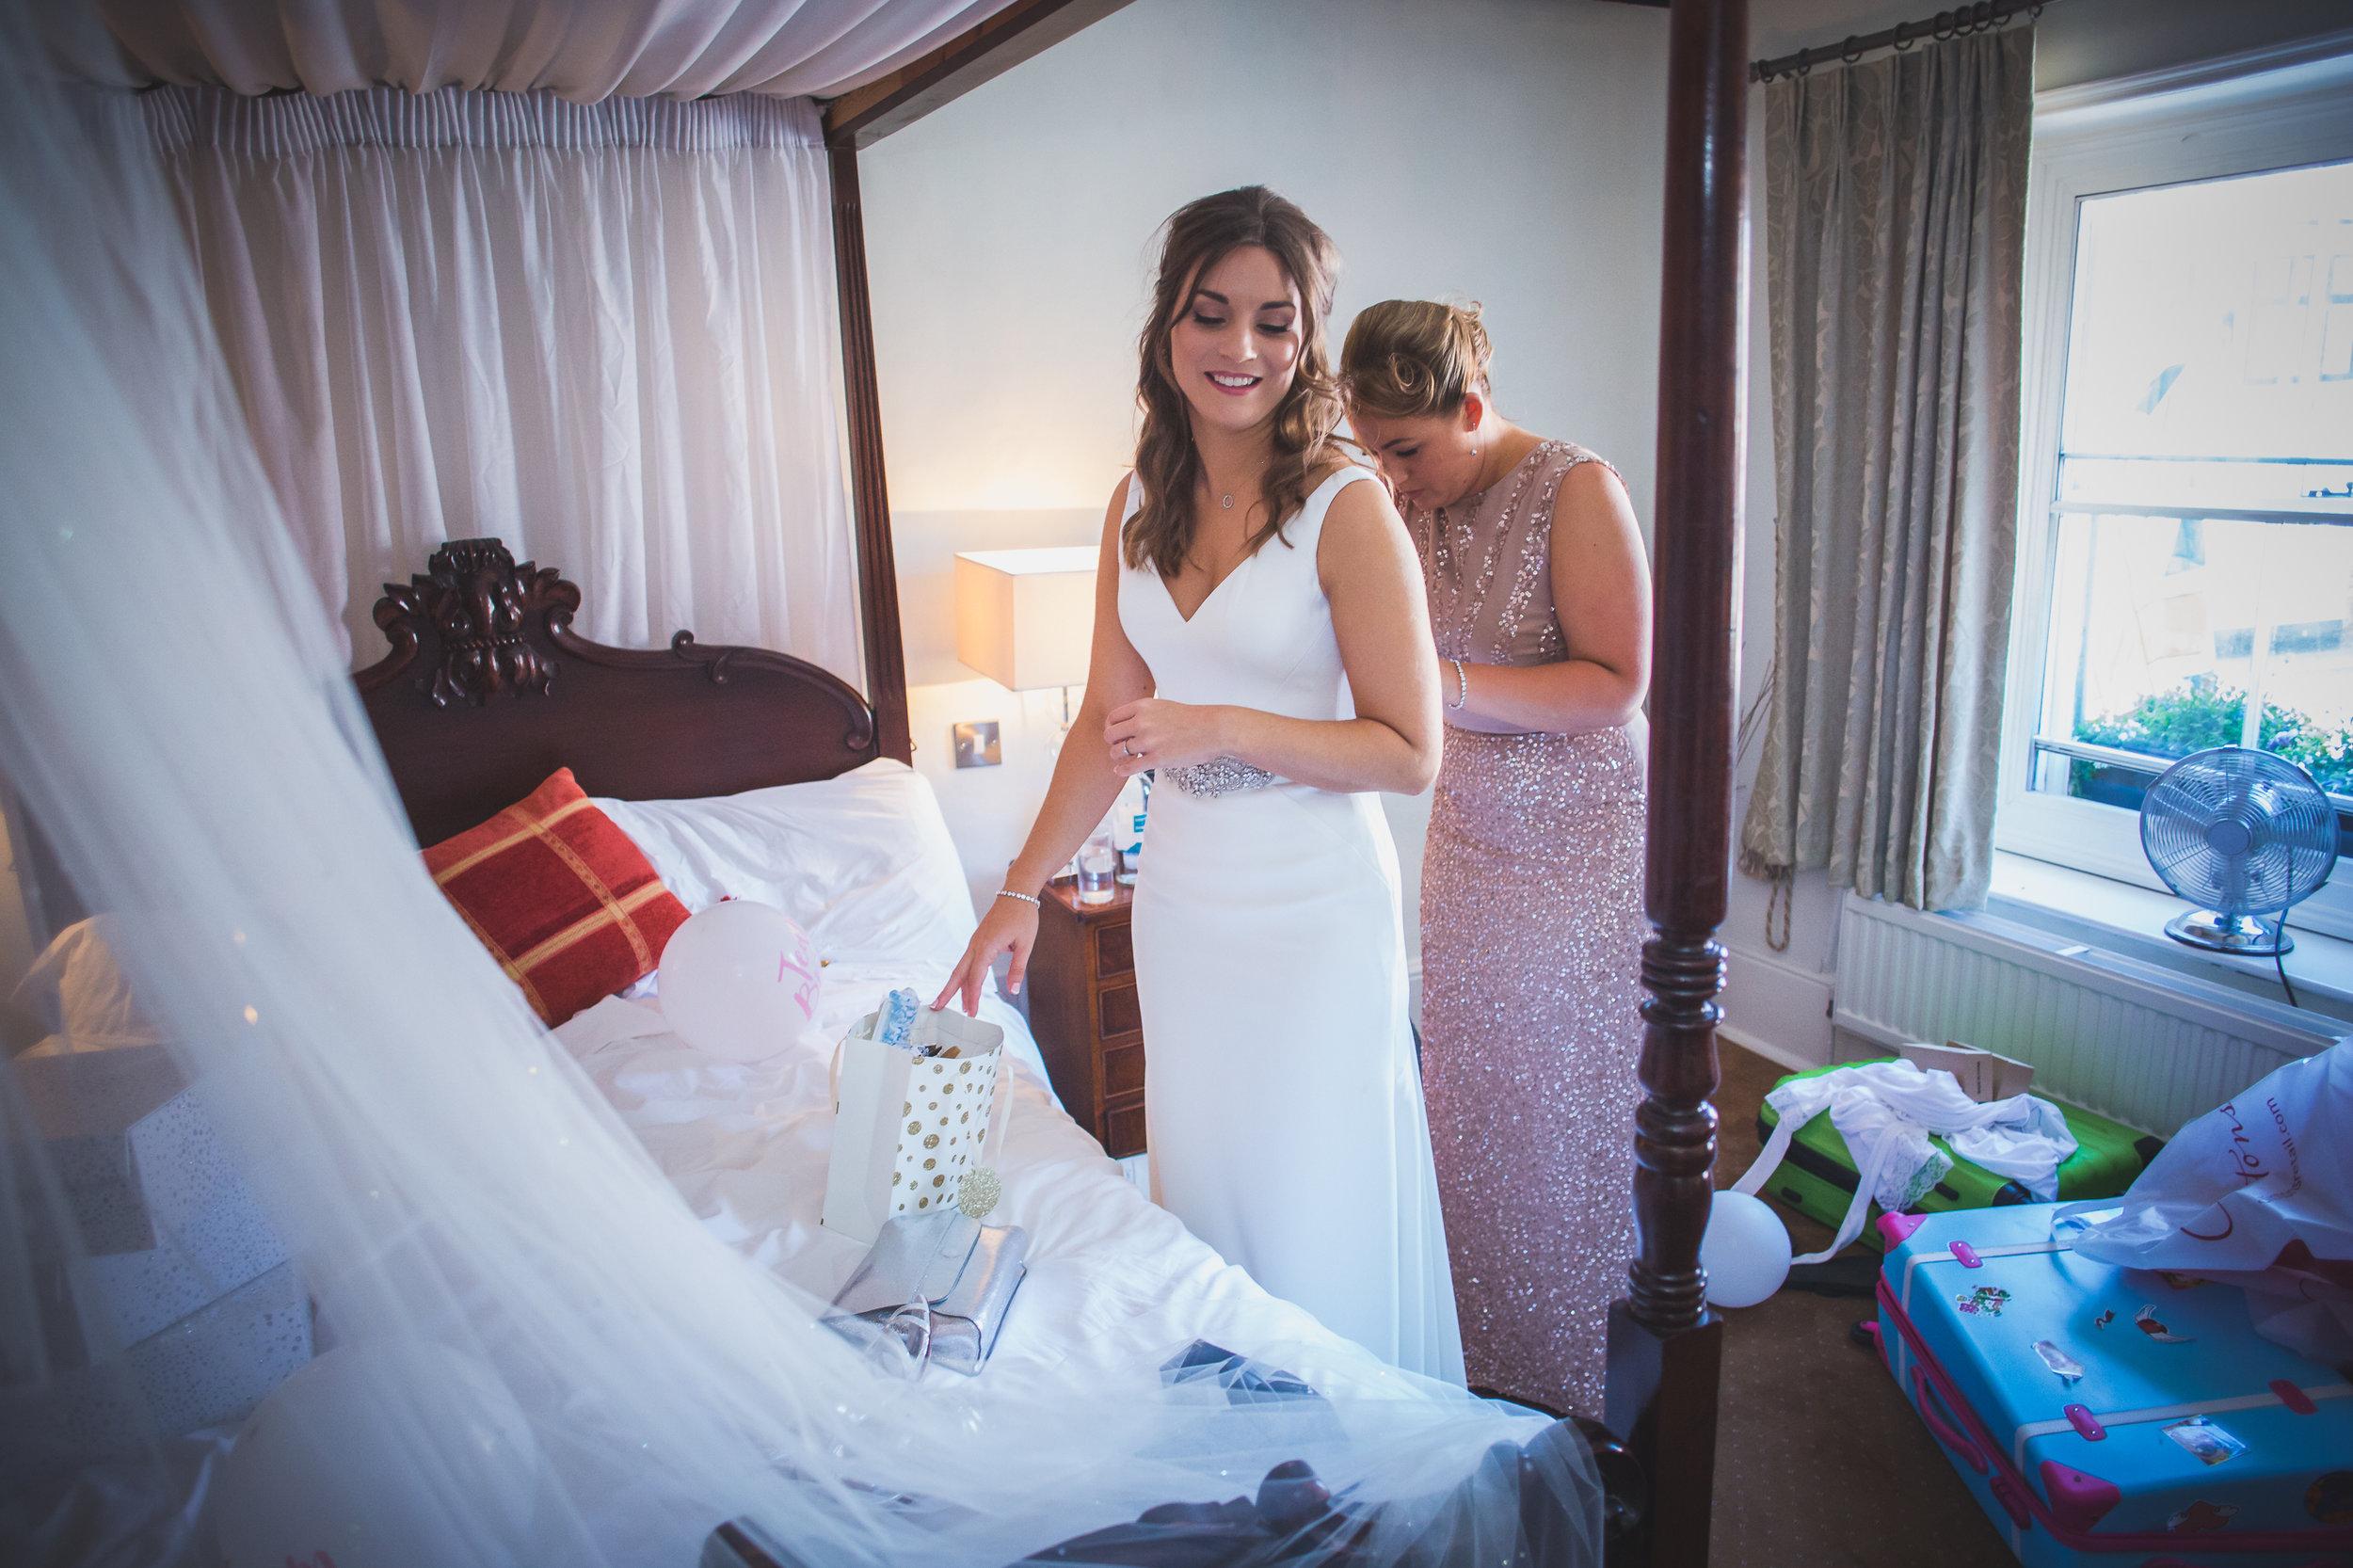 Grittenham Barn female wedding photographers west sussex petworth social-15.jpg